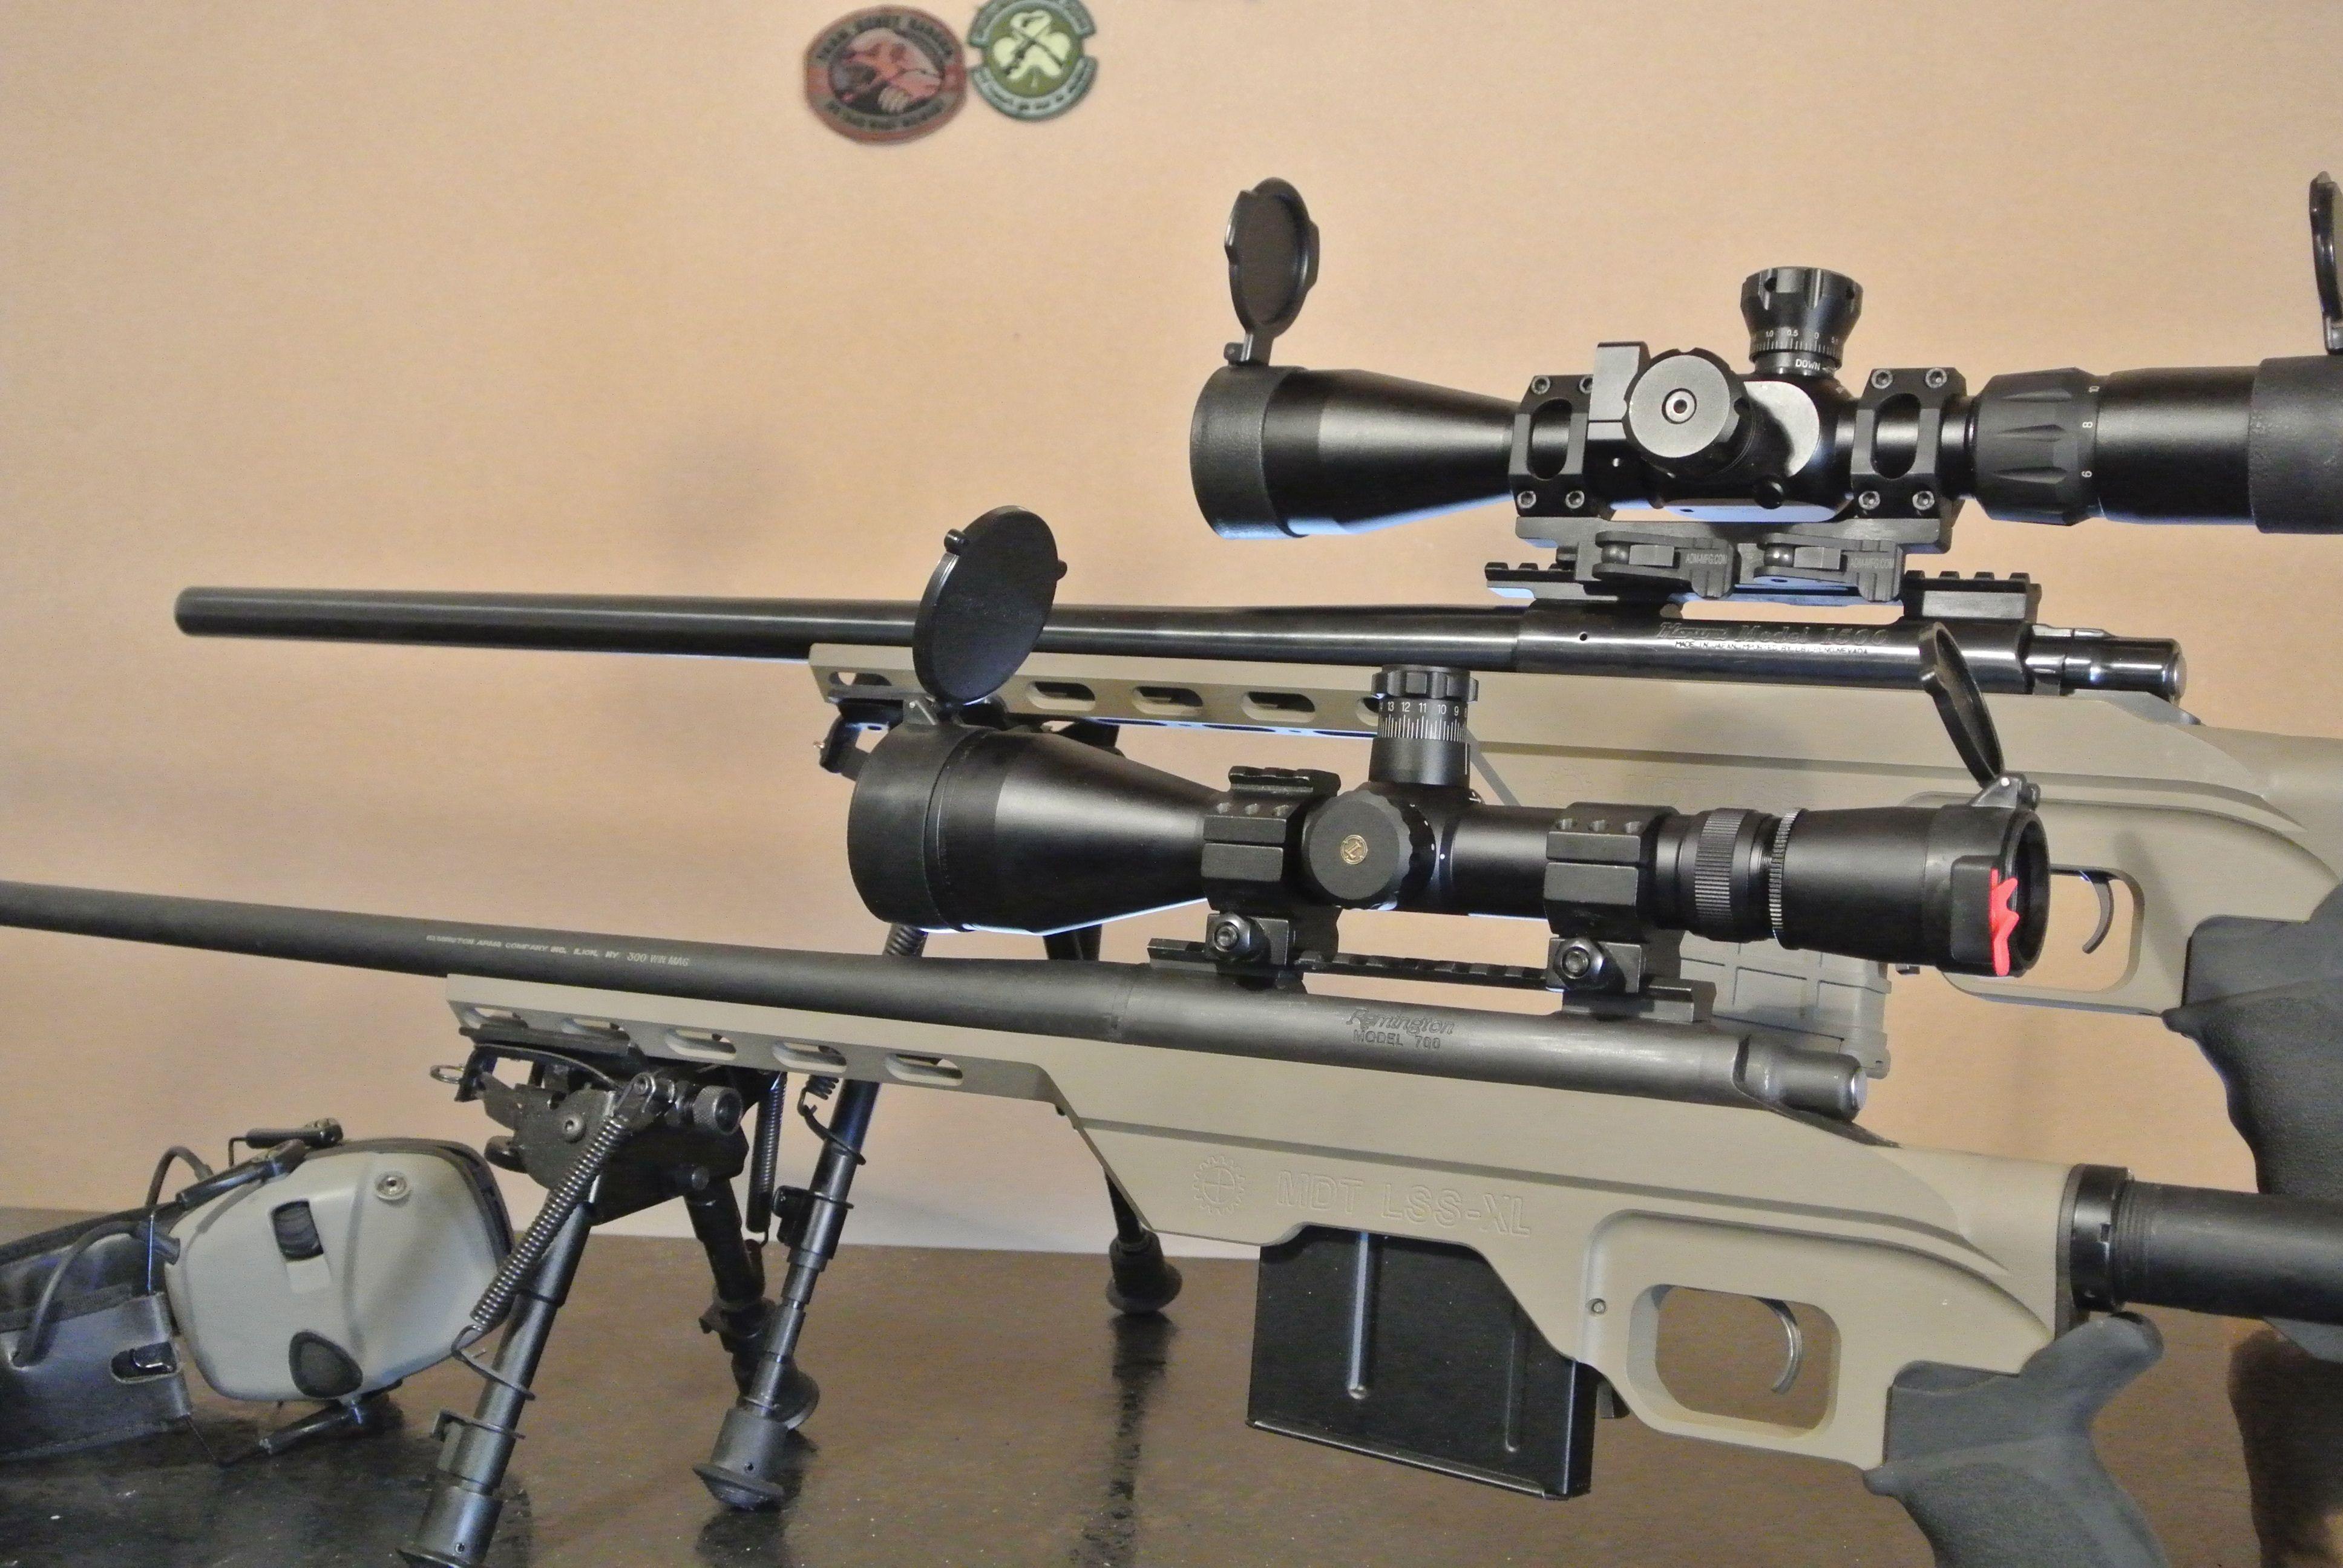 Howa 1500 remington 700 in mdt lssxl chassis guns